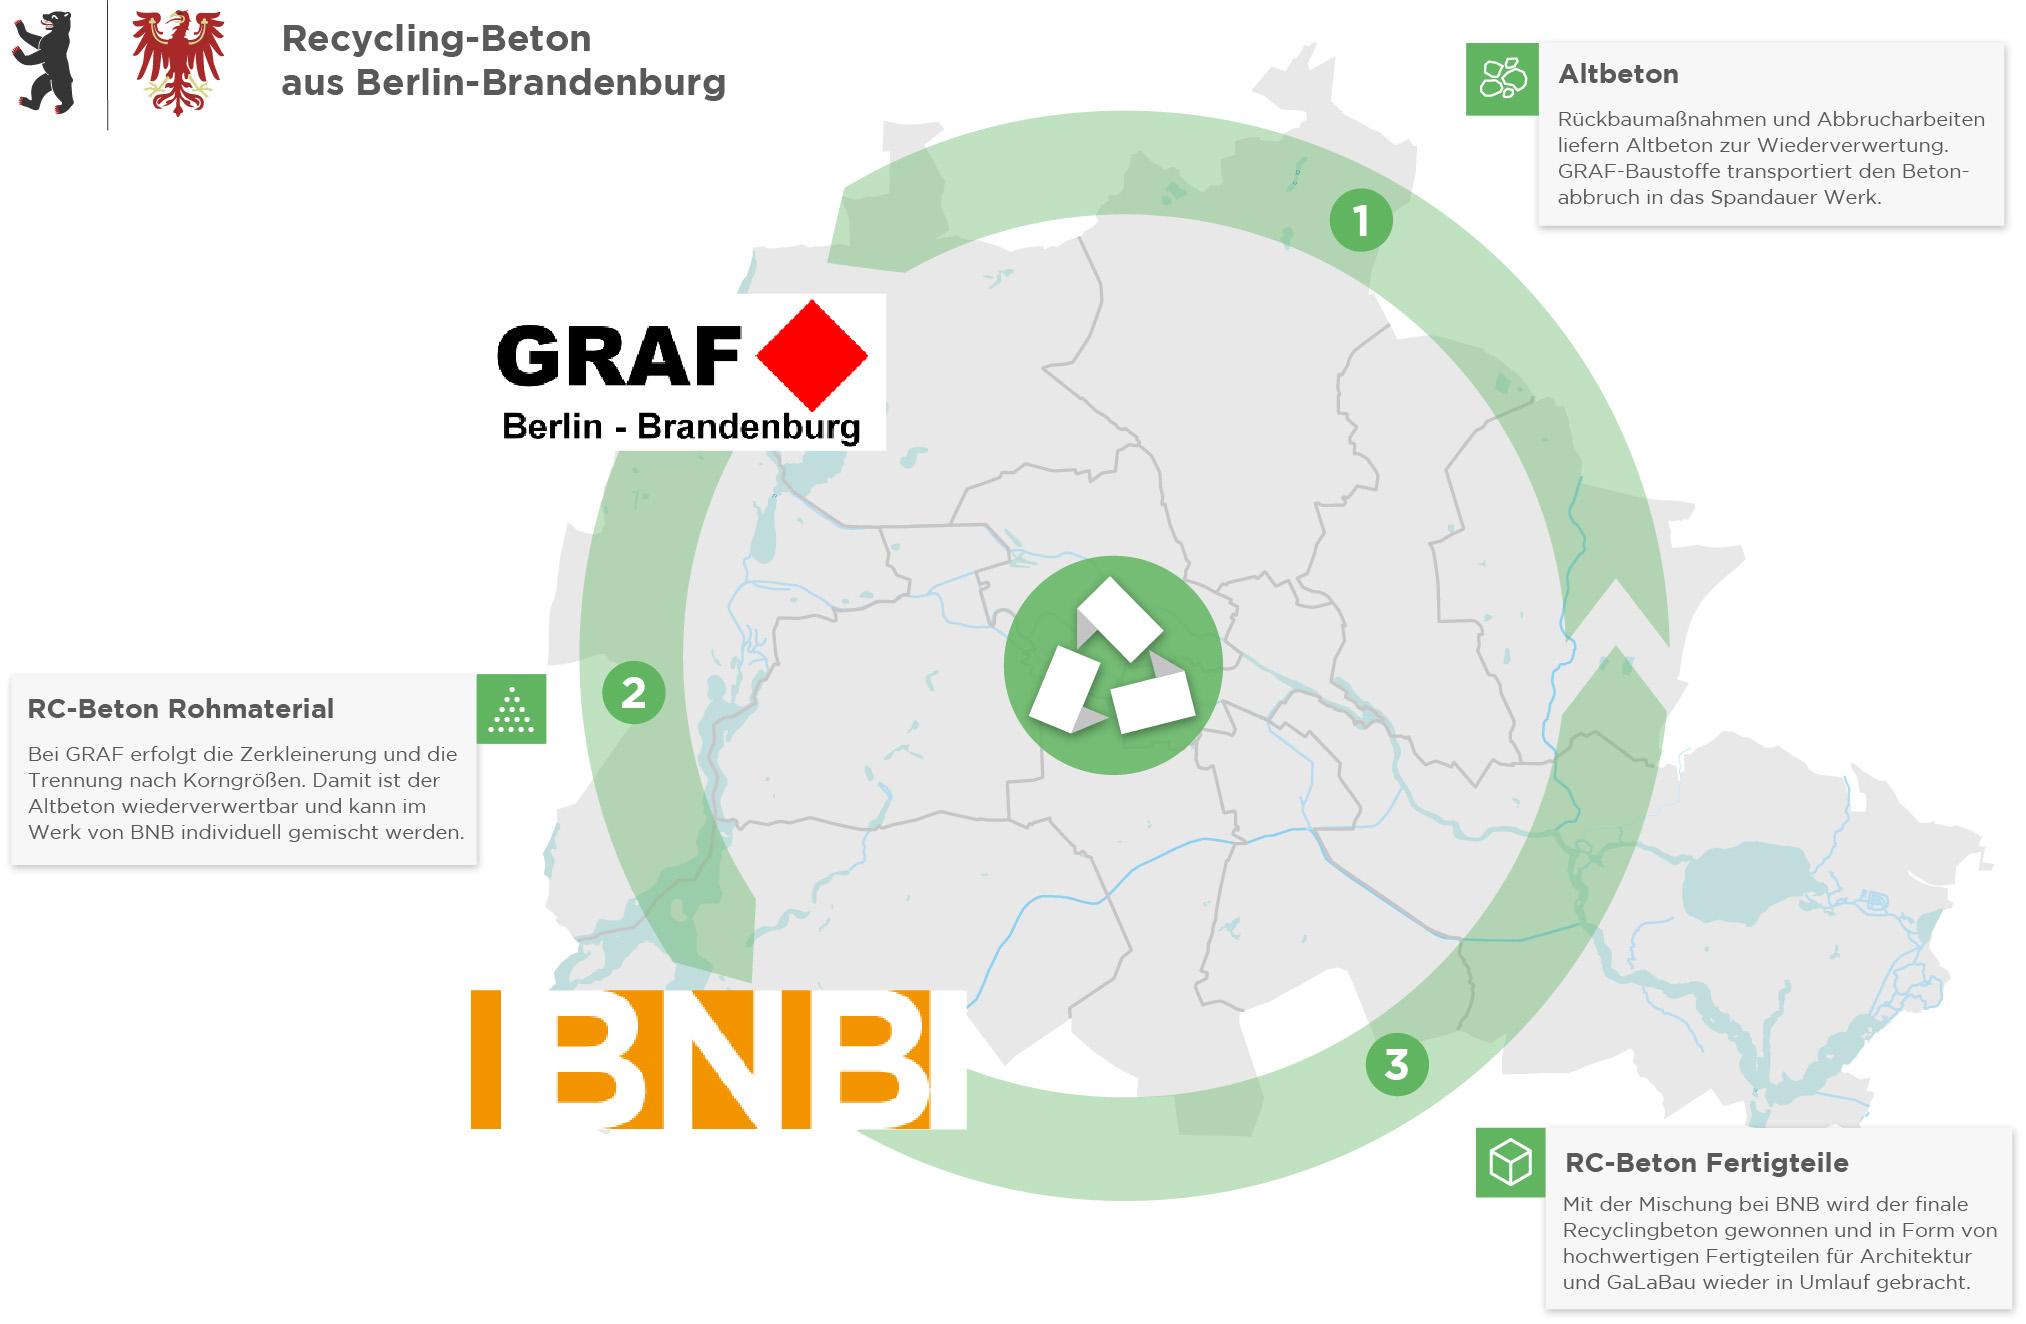 Information über RC-Beton Recyclingbeton Berlin Brandenburg